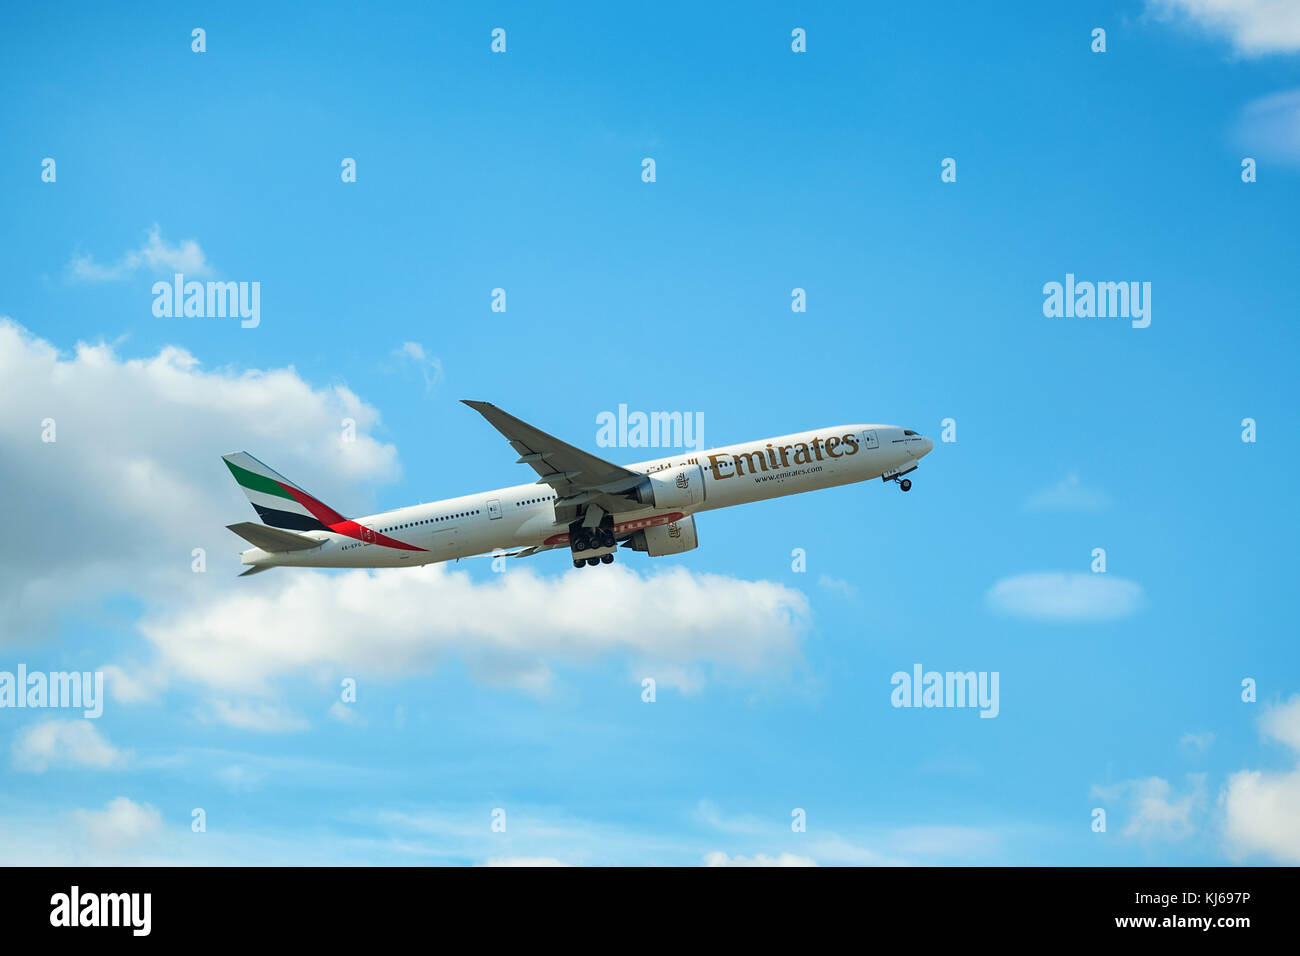 DUBAI, UAE - DECEMBER, 2016: Boeing 777 - Stock Image